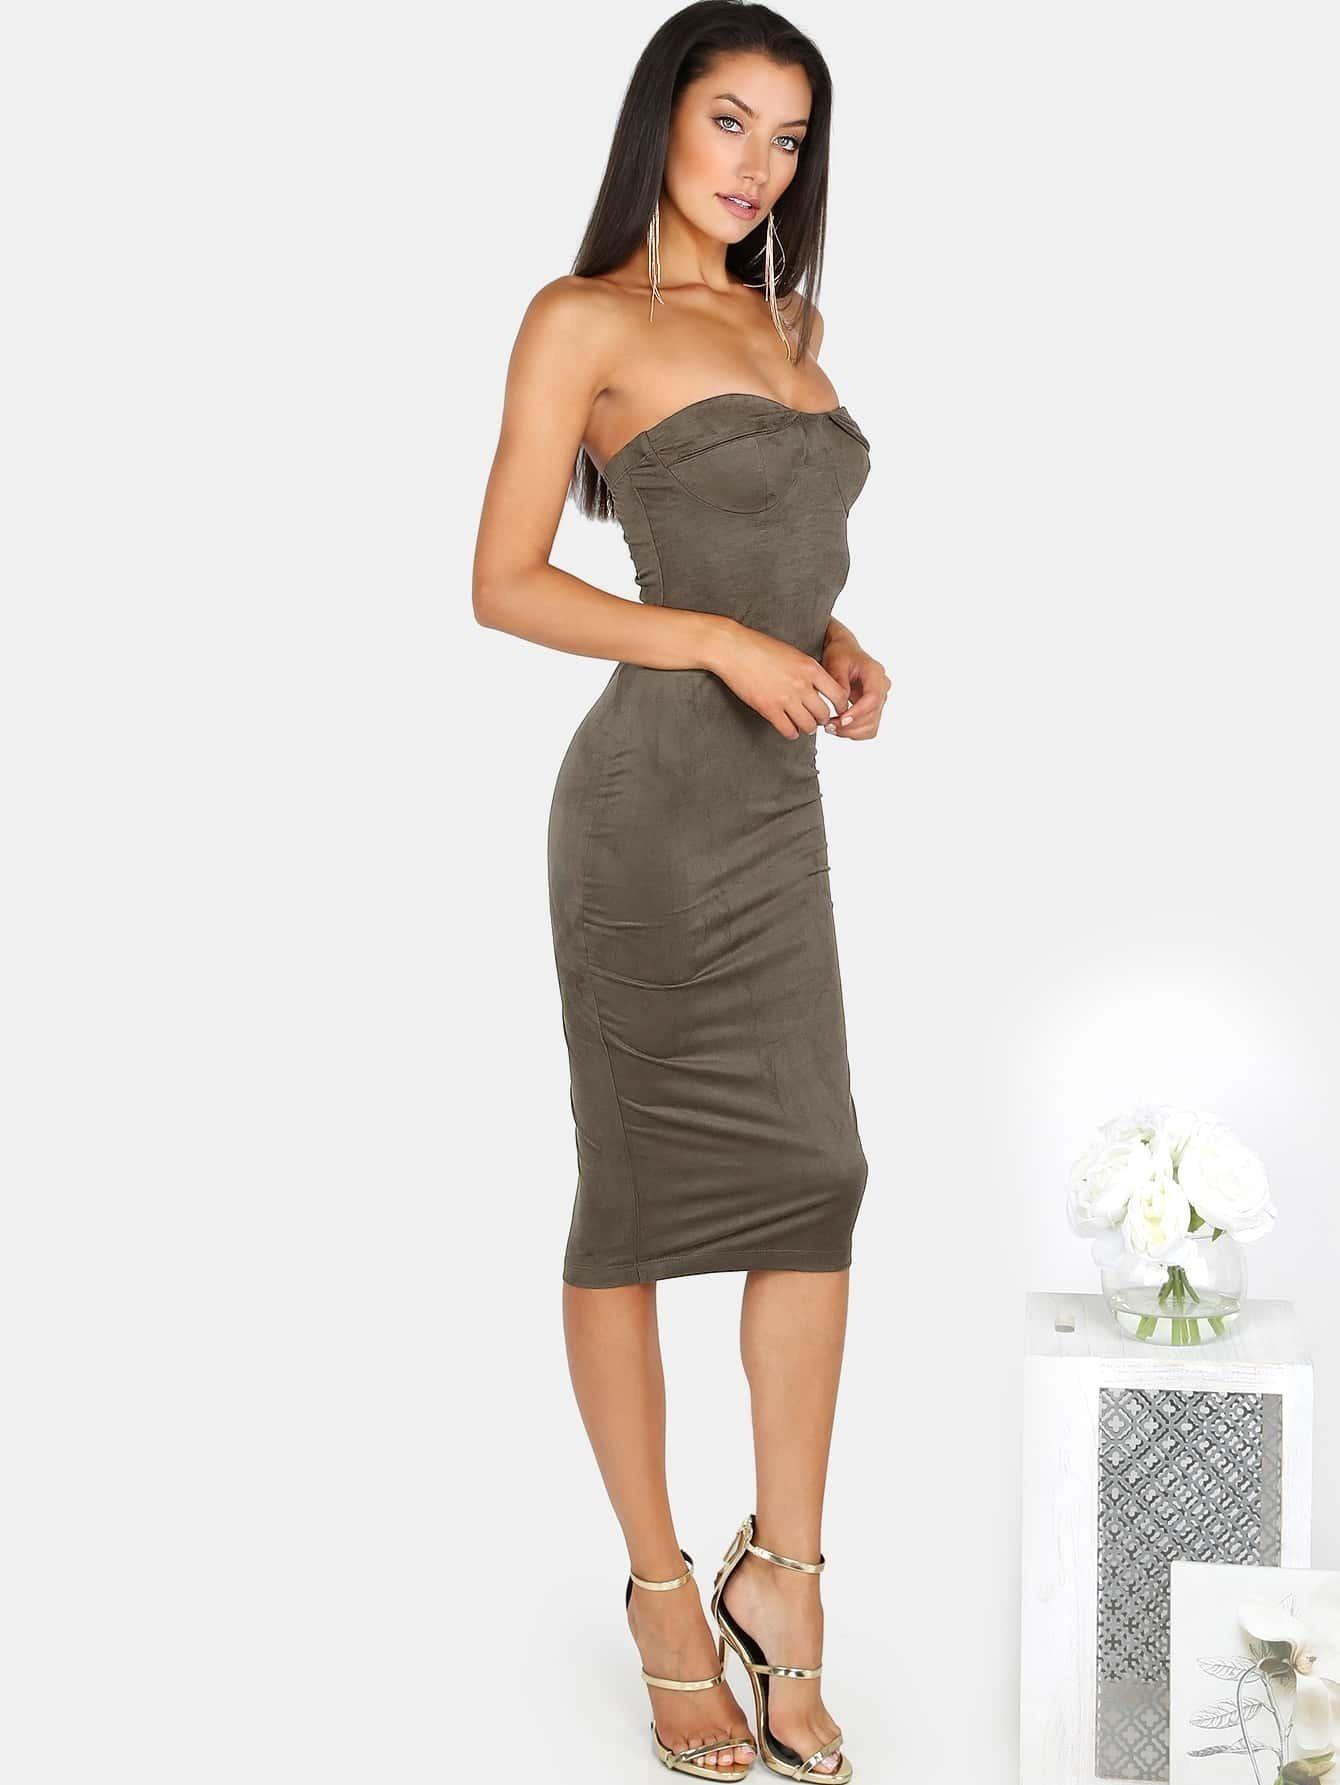 8bdfd4fe56d701 Suede Strapless Bustier Dress OLIVE EmmaCloth-Women Fast Fashion Online